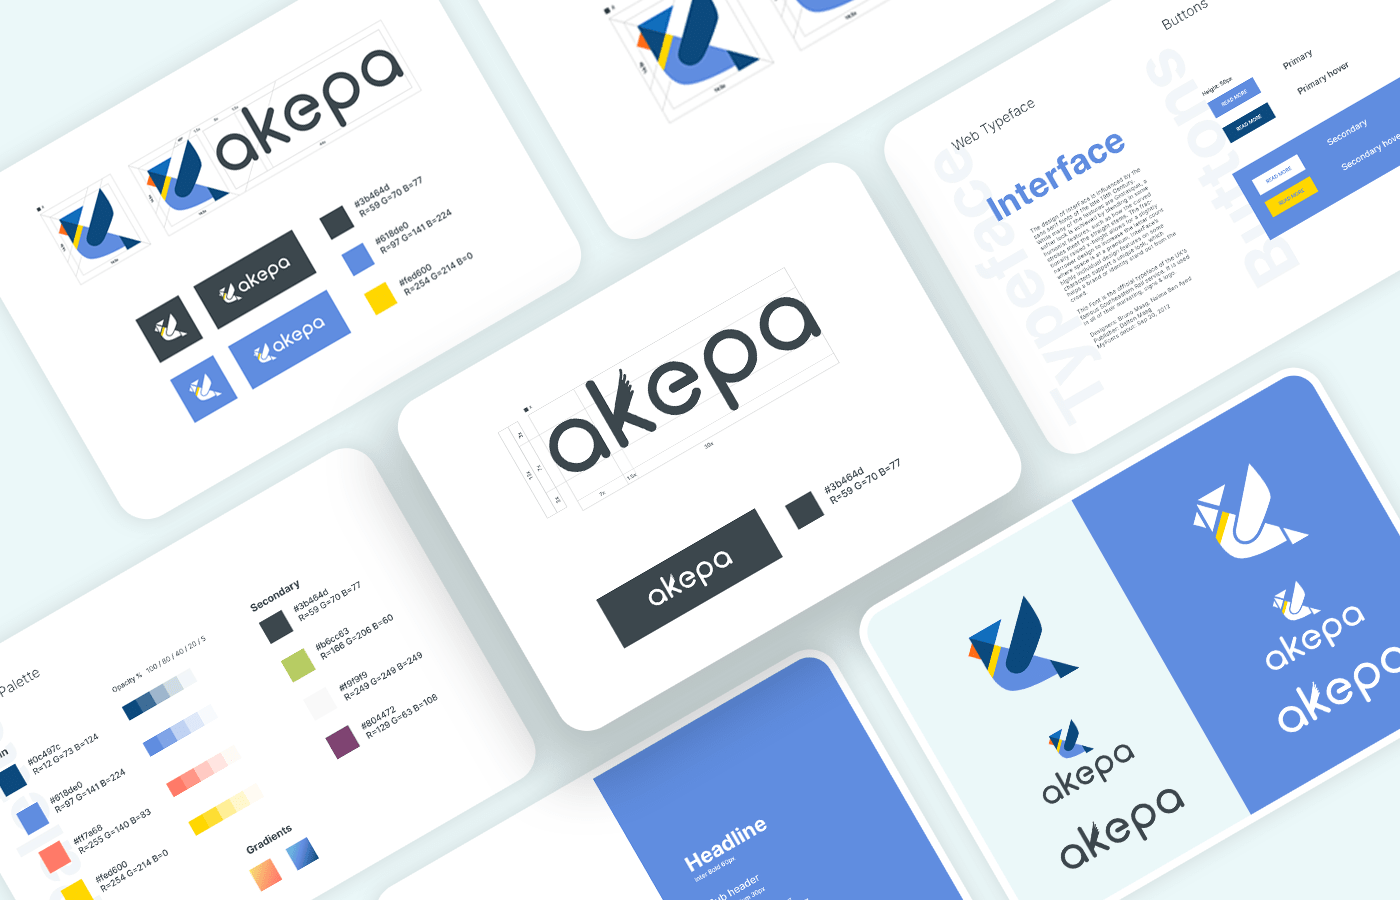 Akepa brand images-min